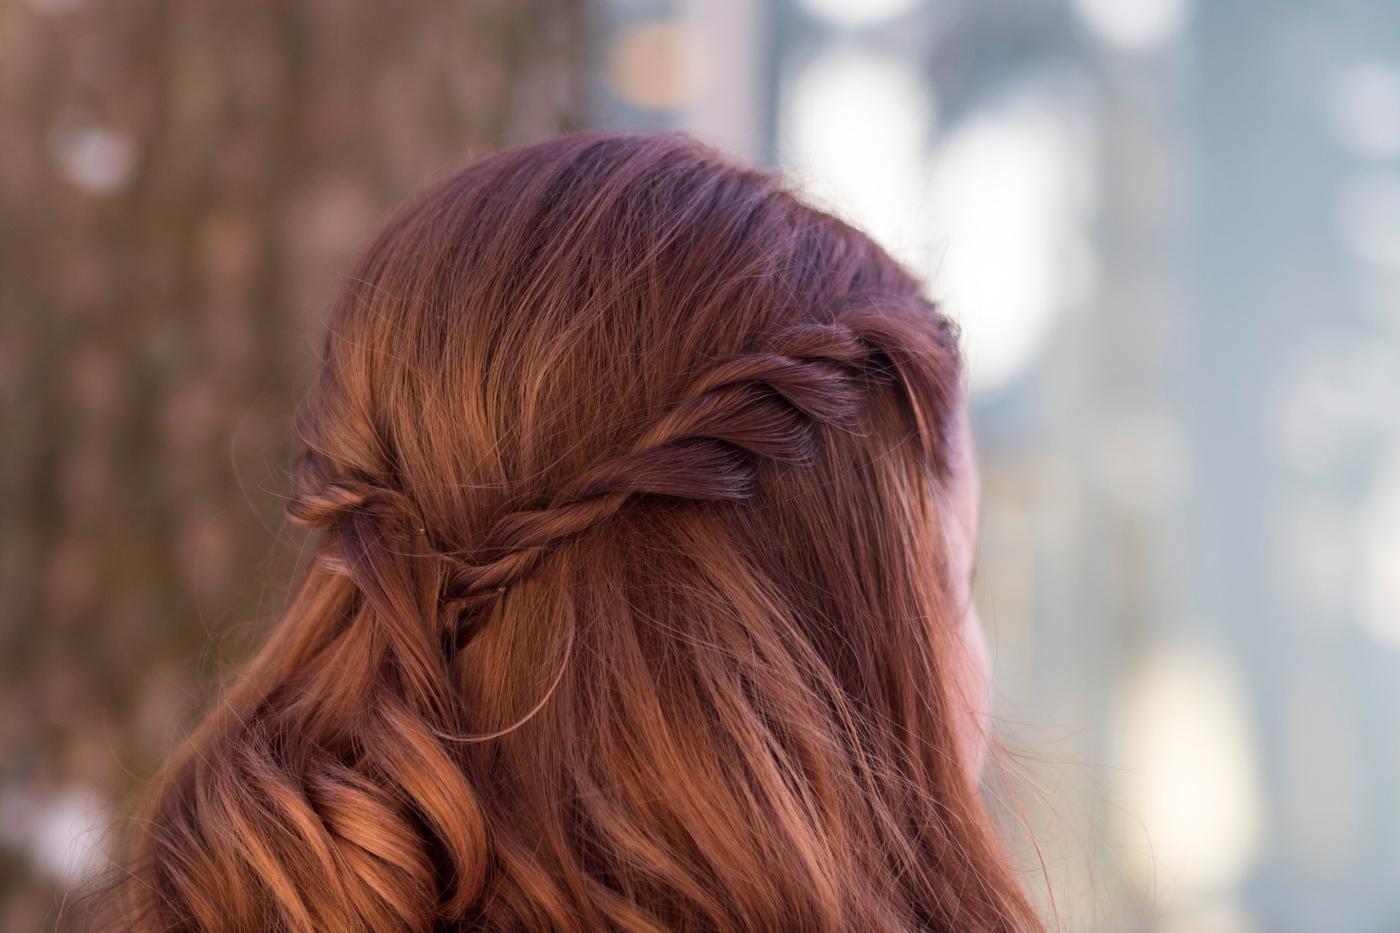 hairstyle.jpeg